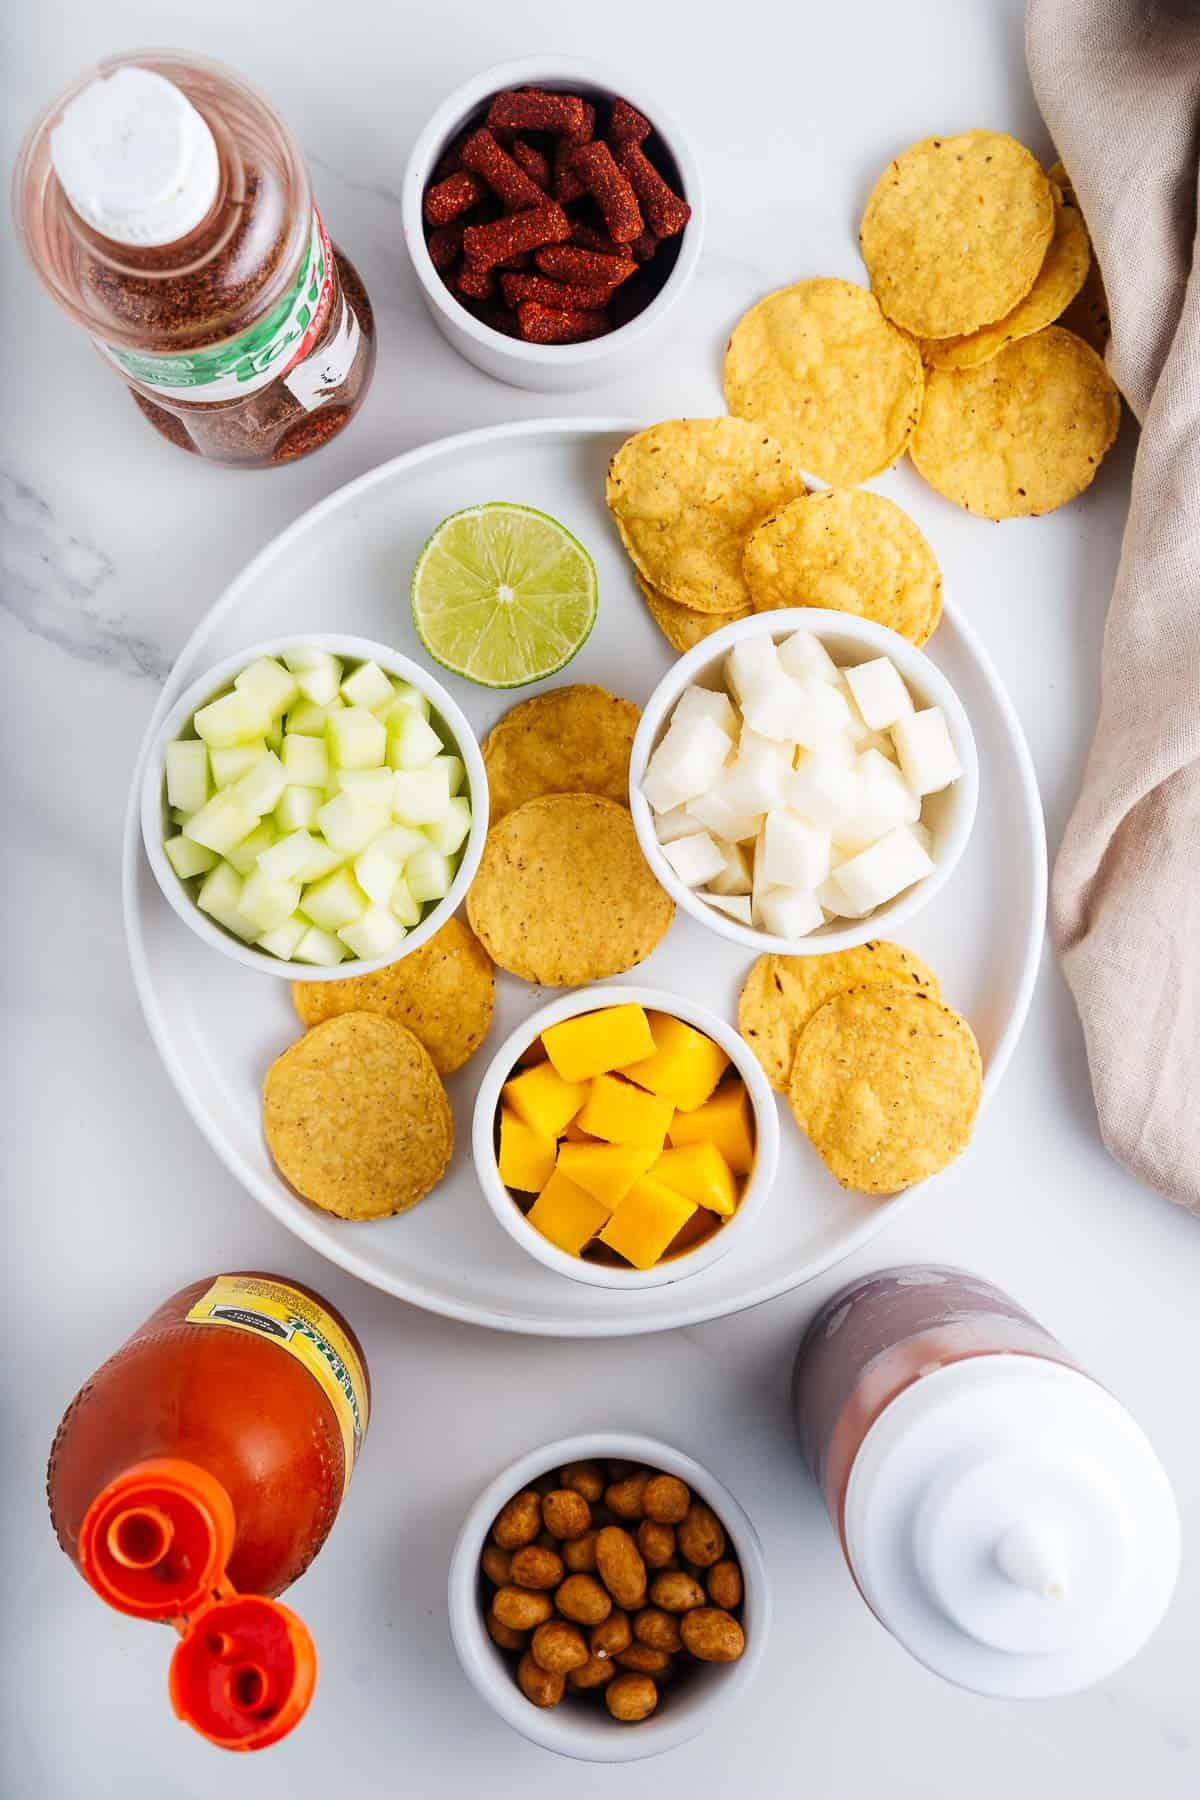 Tortilla Chips, Valentina, Japones, Chamoy, Jicama, Cucumber, Mango, Rielitos, and Tajin